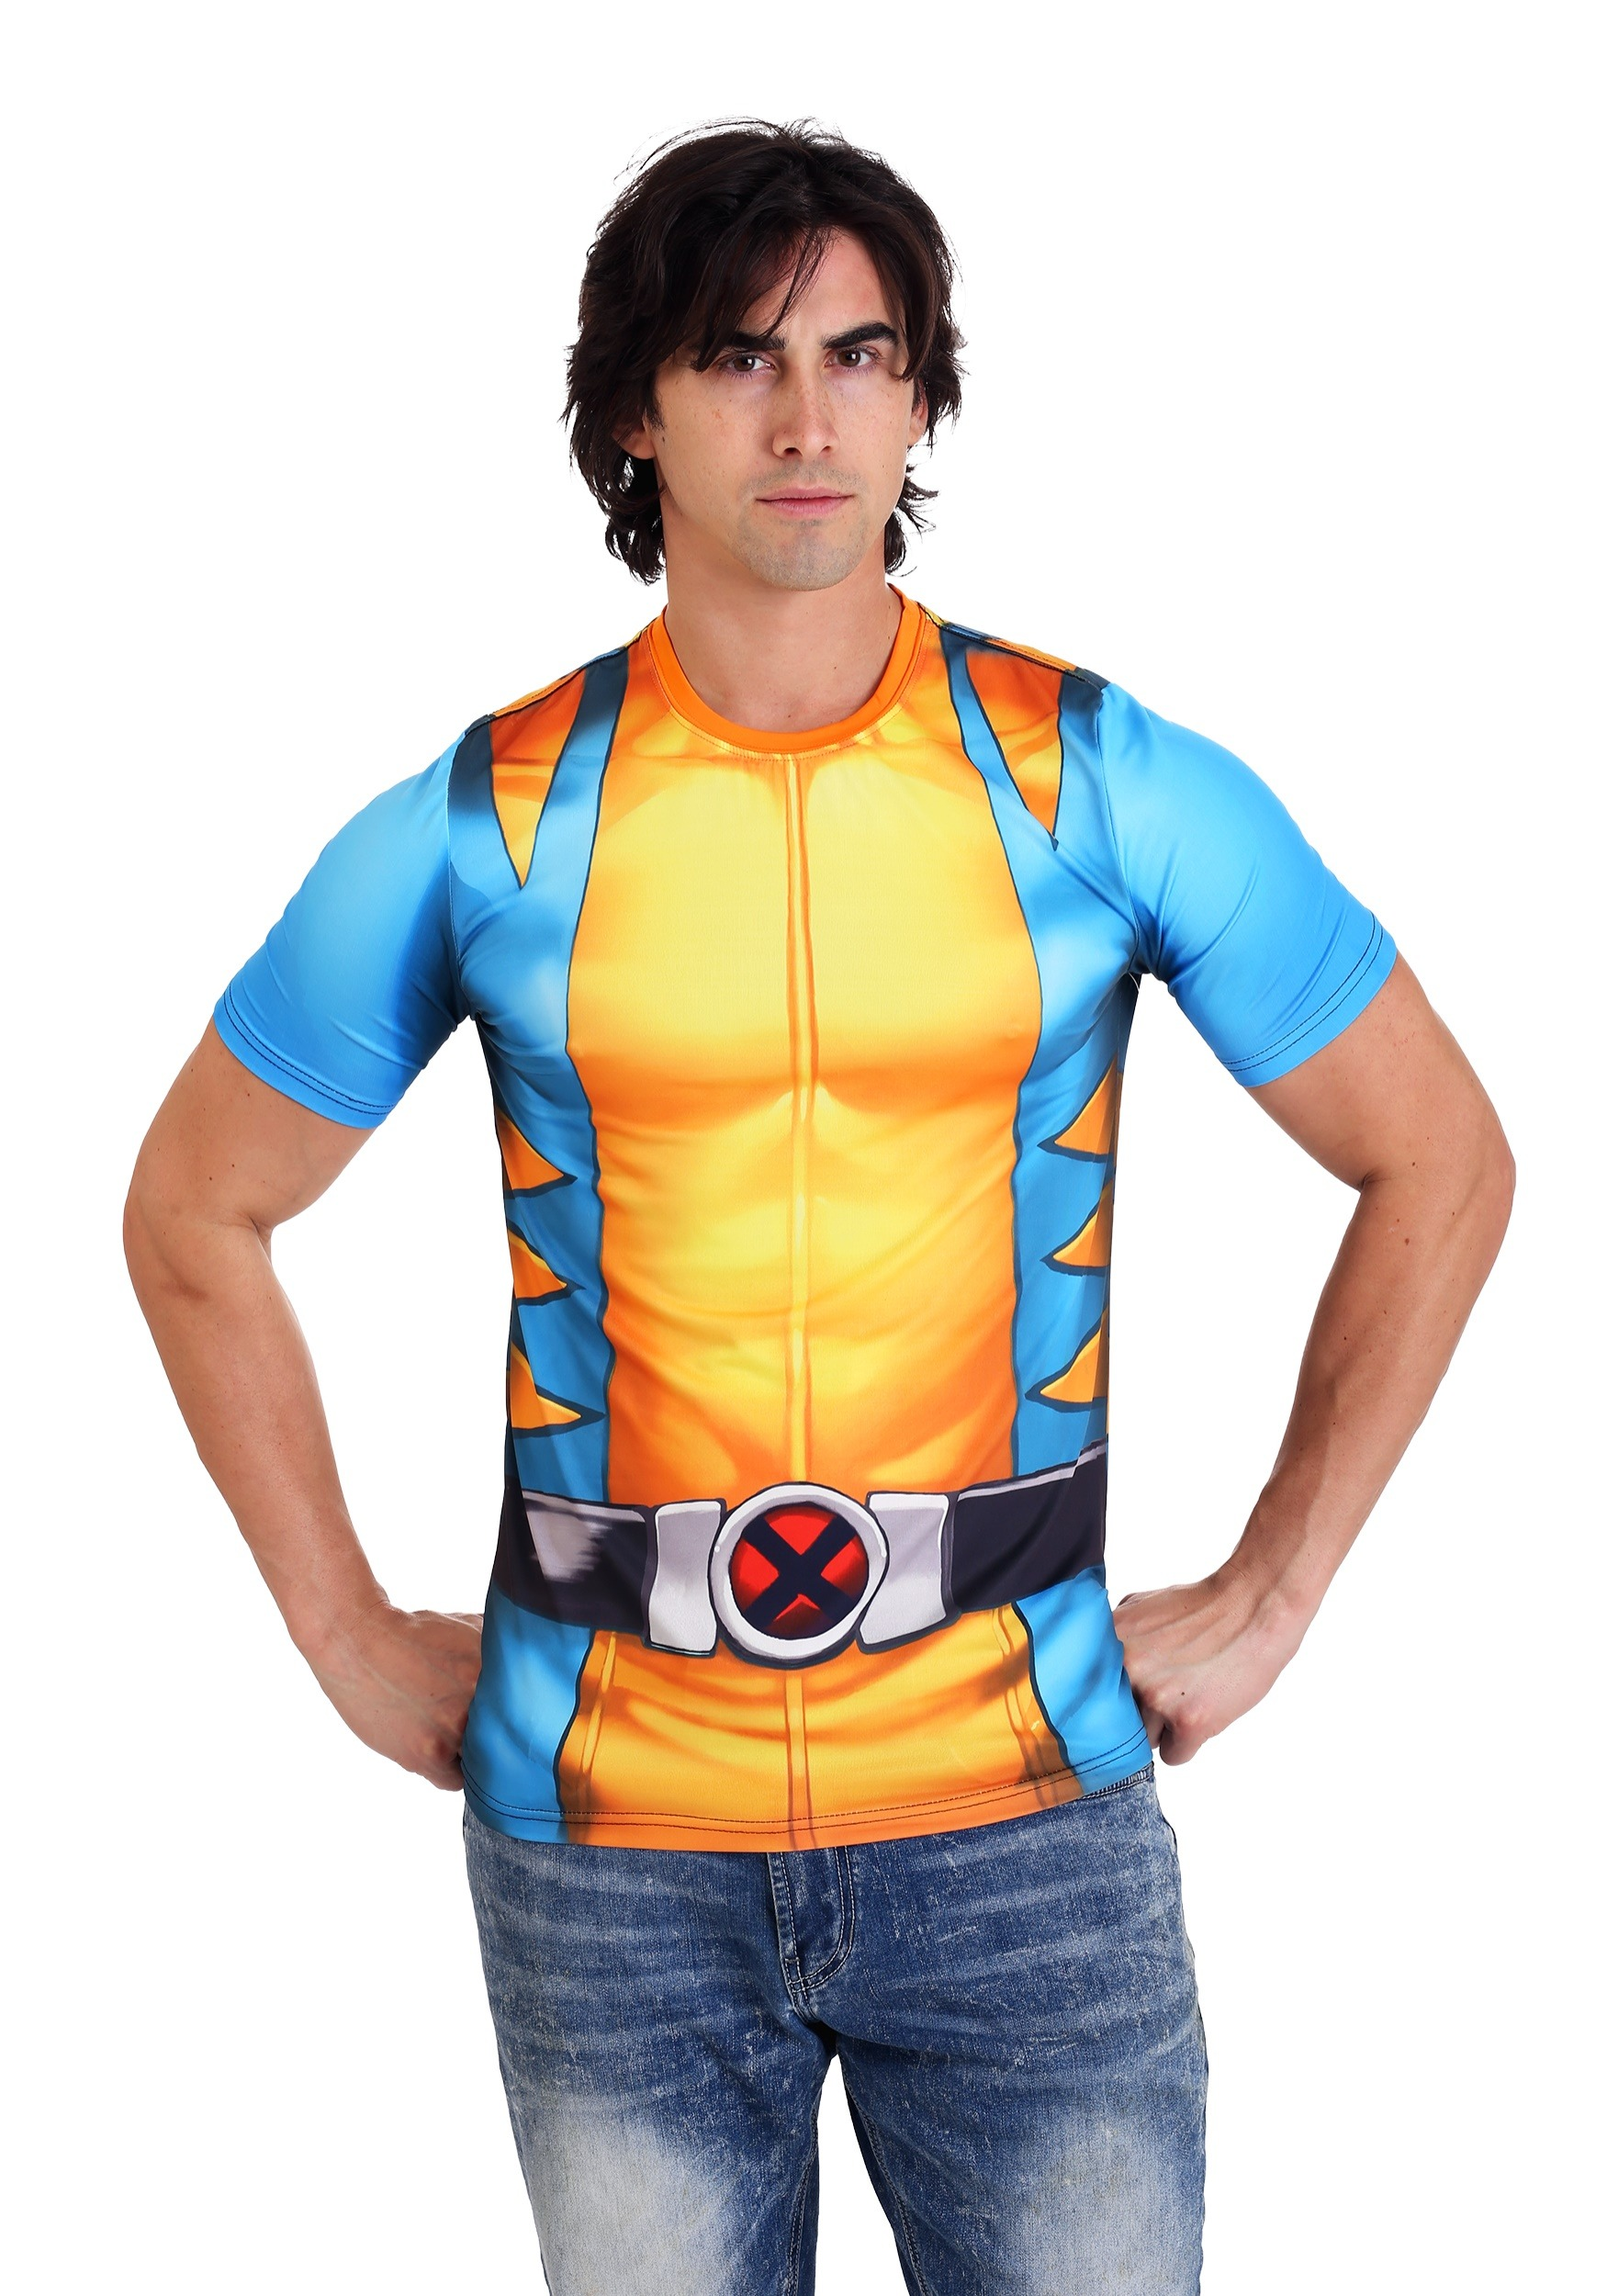 Marvel's X-Men Wolverine Mens Costume Tee